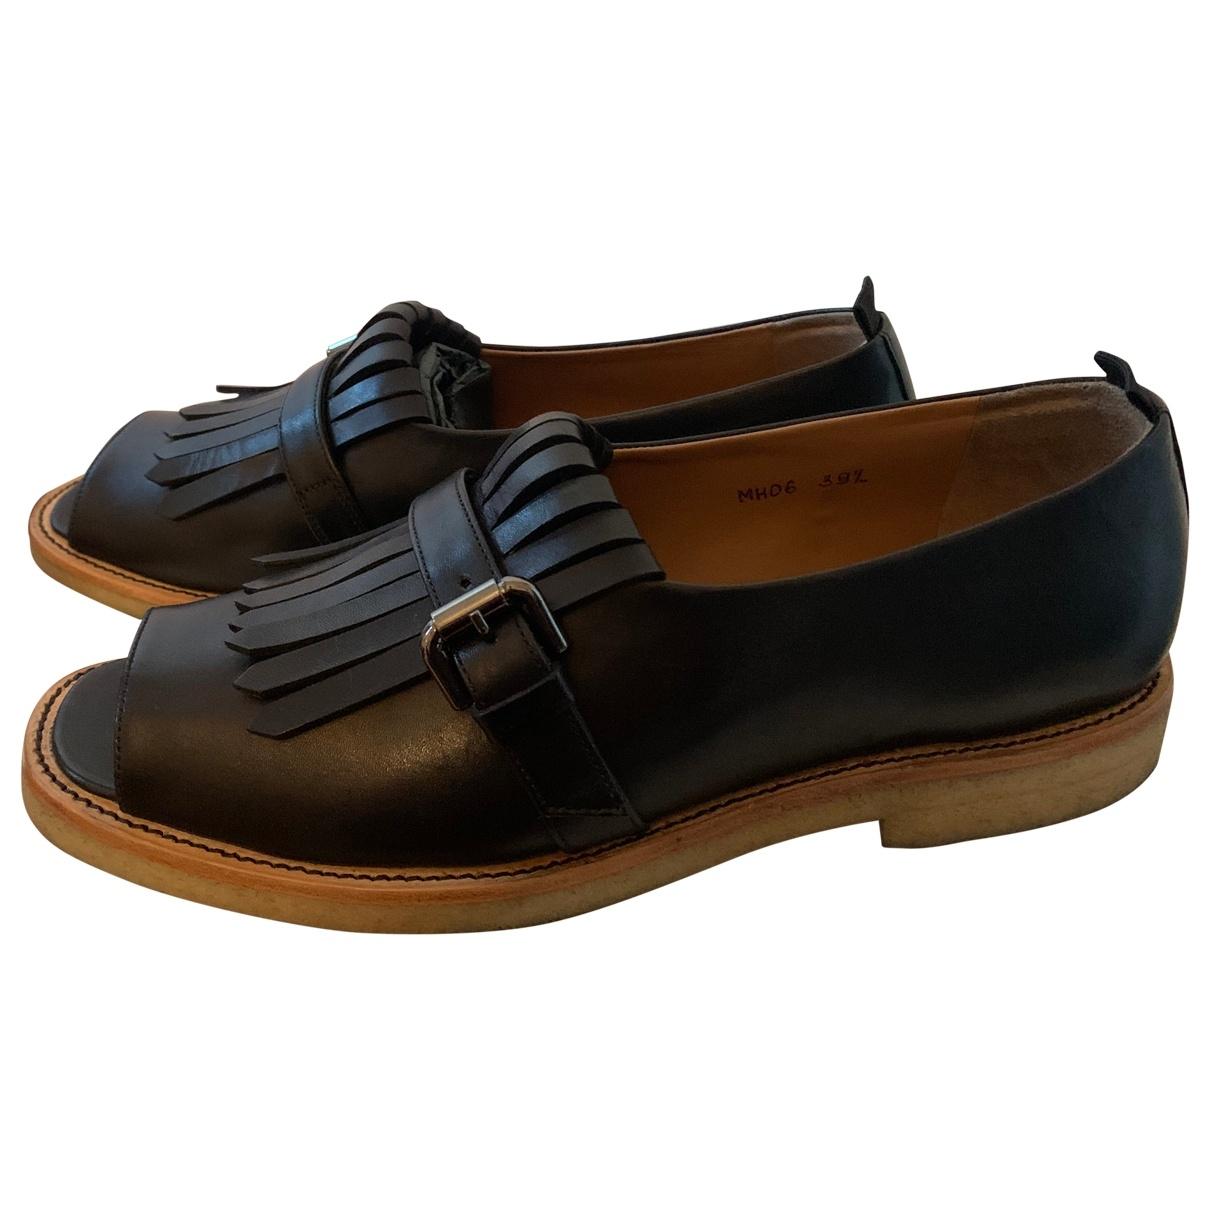 Margaret Howell \N Blue Leather Flats for Women 39.5 EU